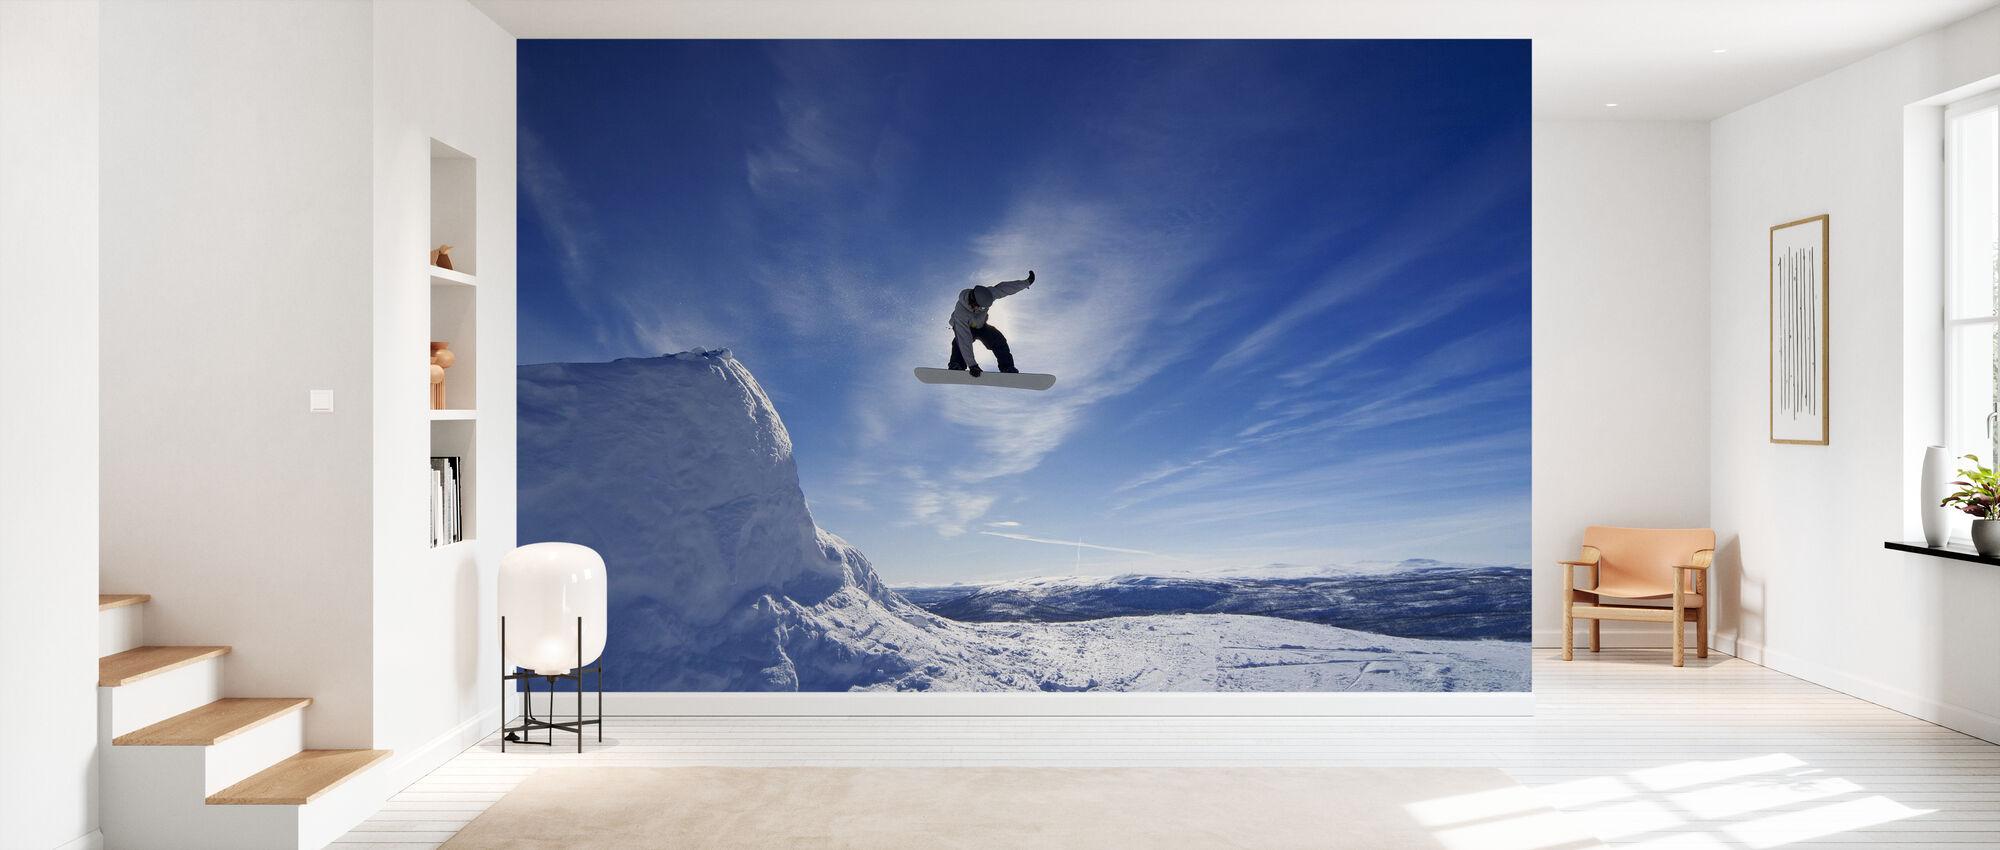 Snowboard Big Air Jump - Wallpaper - Hallway